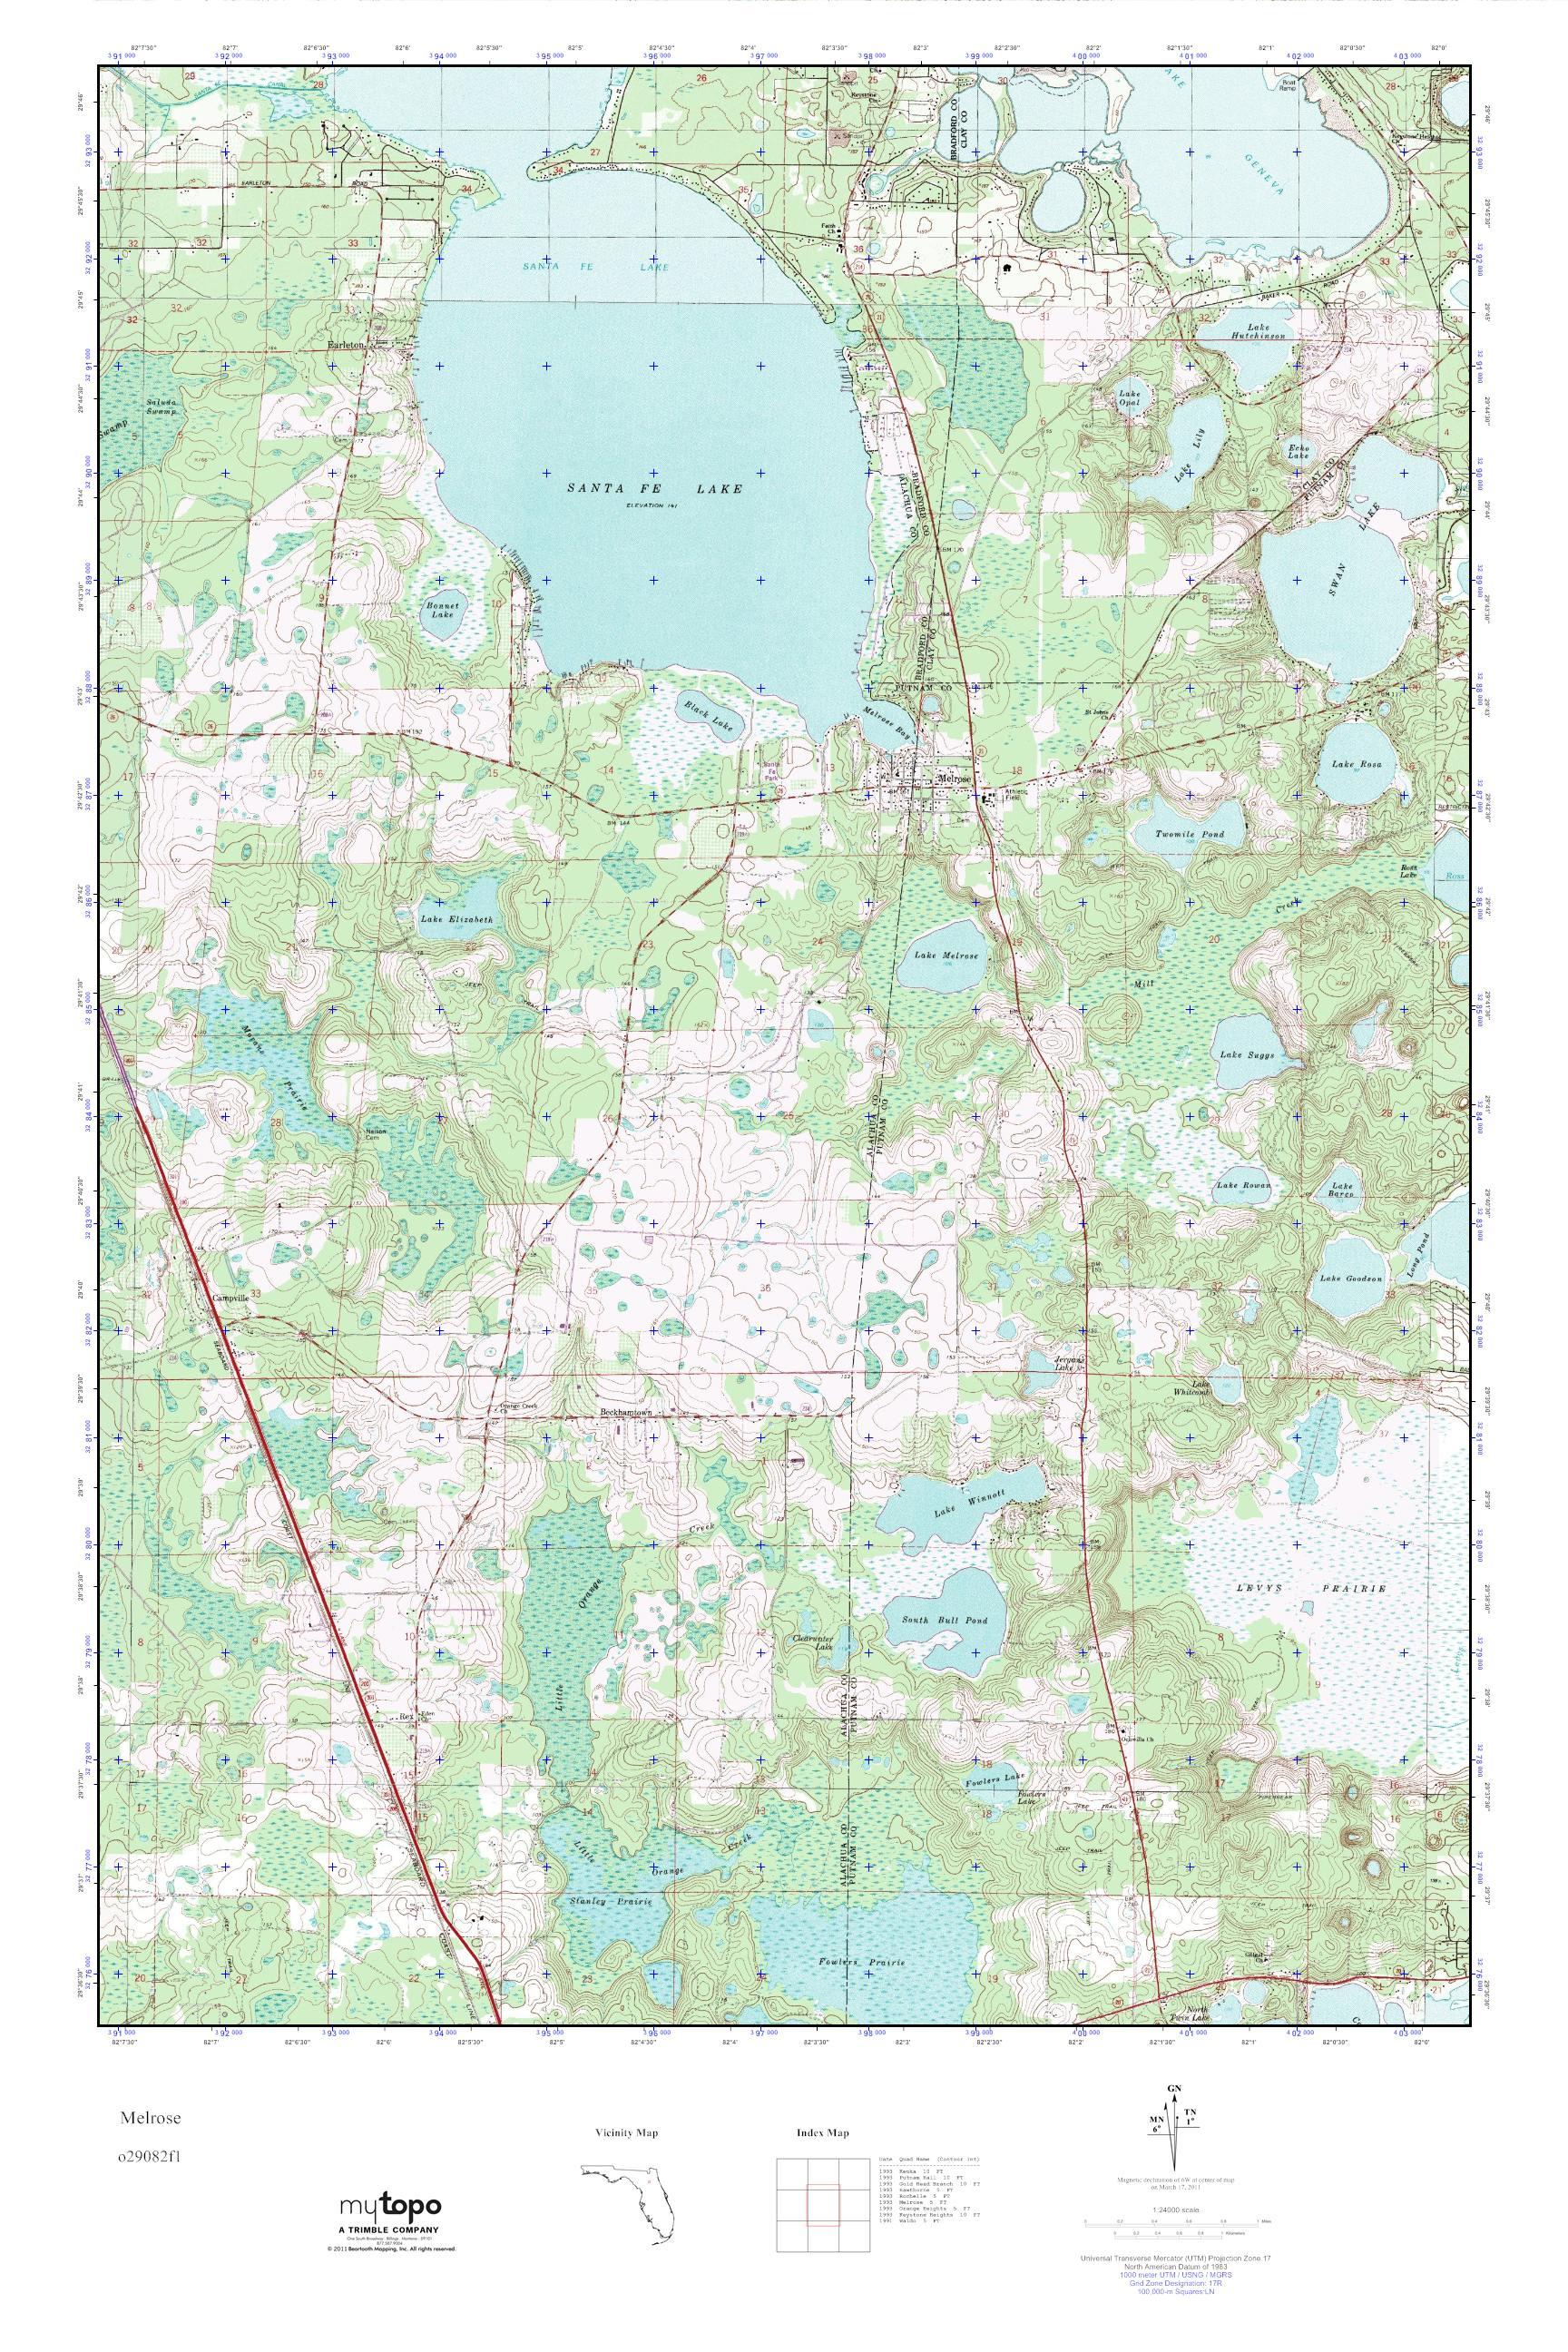 Melrose Florida Map.Mytopo Melrose Florida Usgs Quad Topo Map